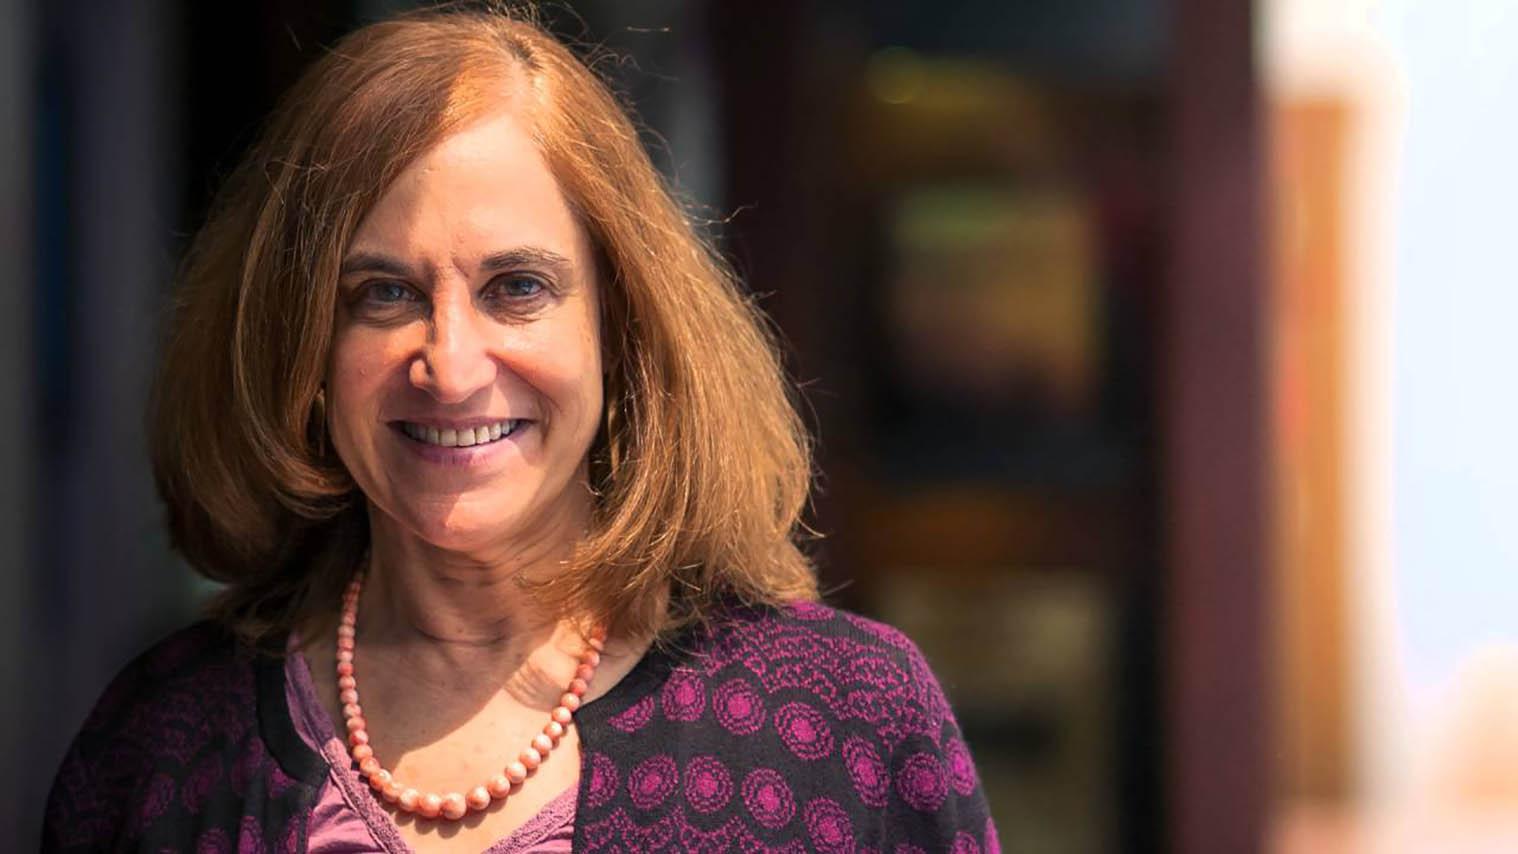 headshot of Bonnie S. Glaser